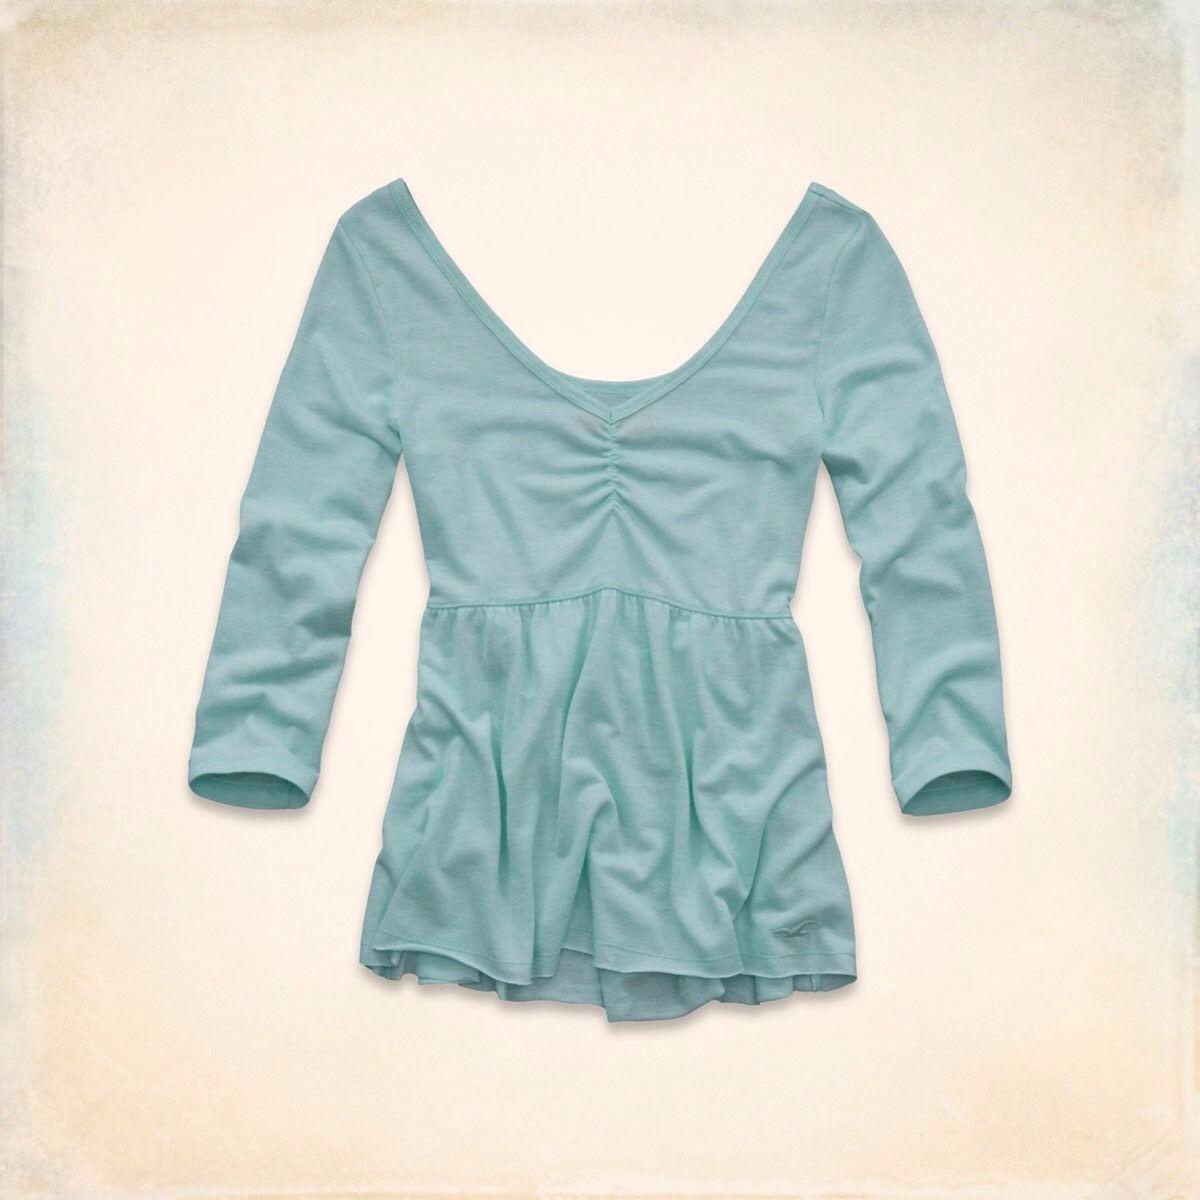 54ce23ae26 camiseta feminina hollister polo tommy blusa gap abercrombie. Carregando  zoom.